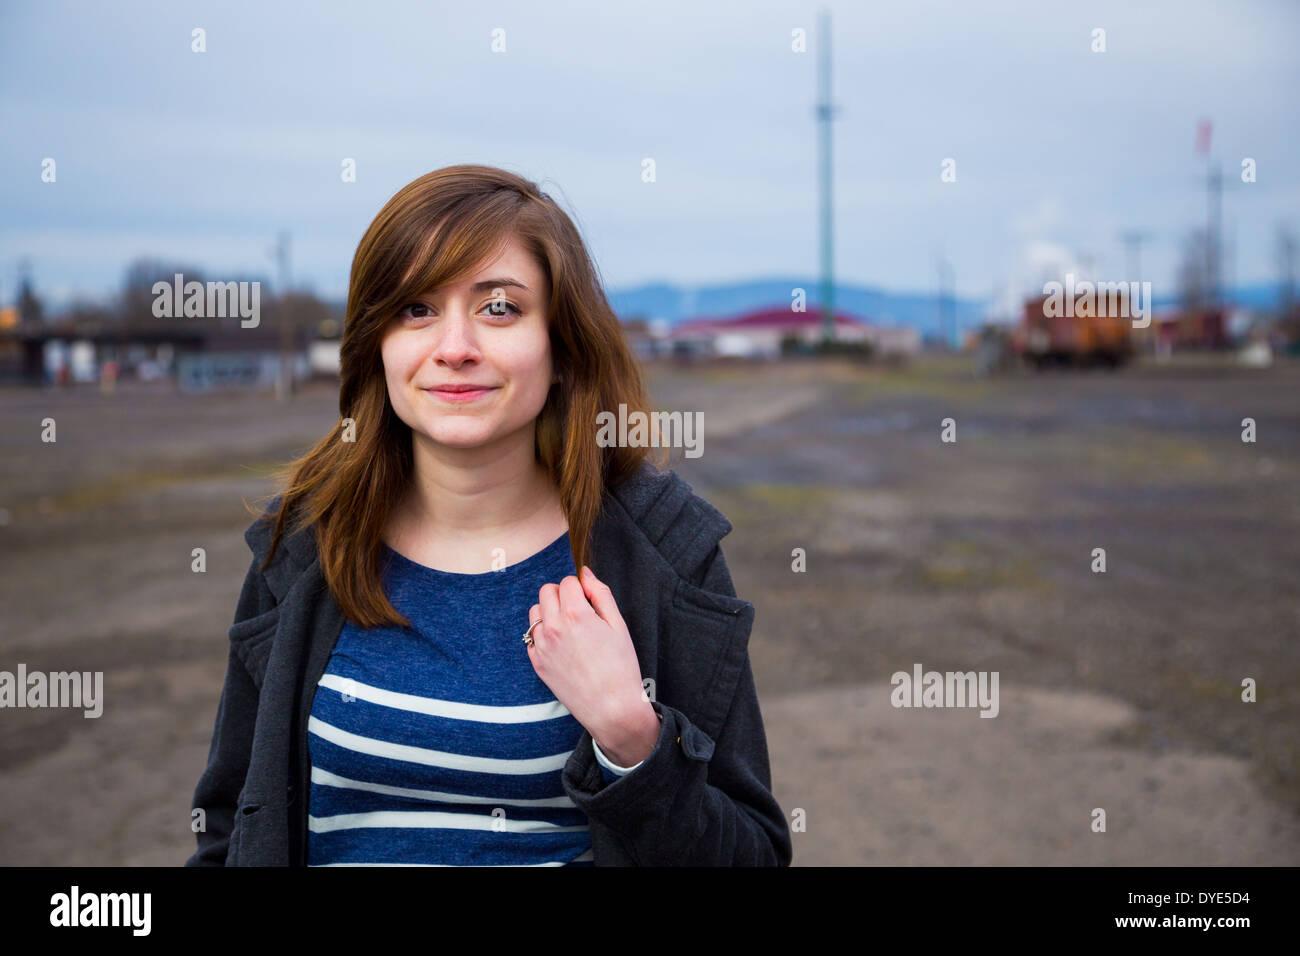 Modernos, hipster chica en un patio de trenes abandonados al atardecer en este retrato de estilo de moda. Imagen De Stock